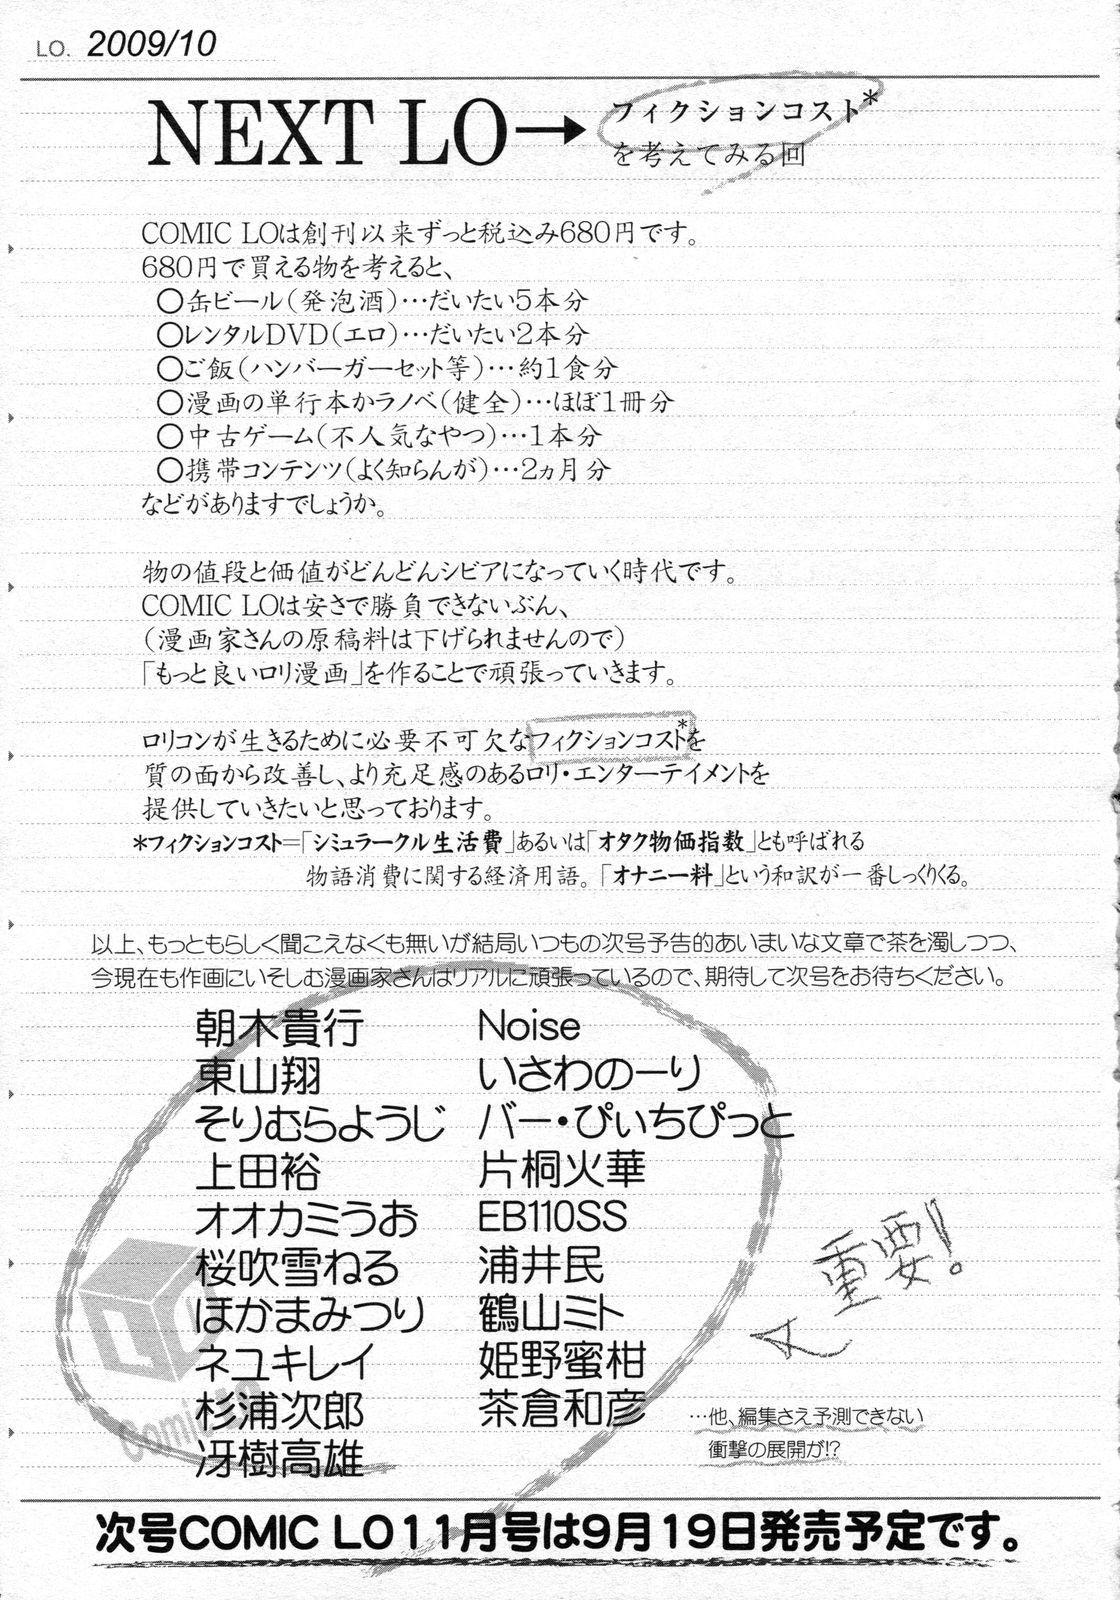 COMIC LO 2009-10 Vol. 67 351